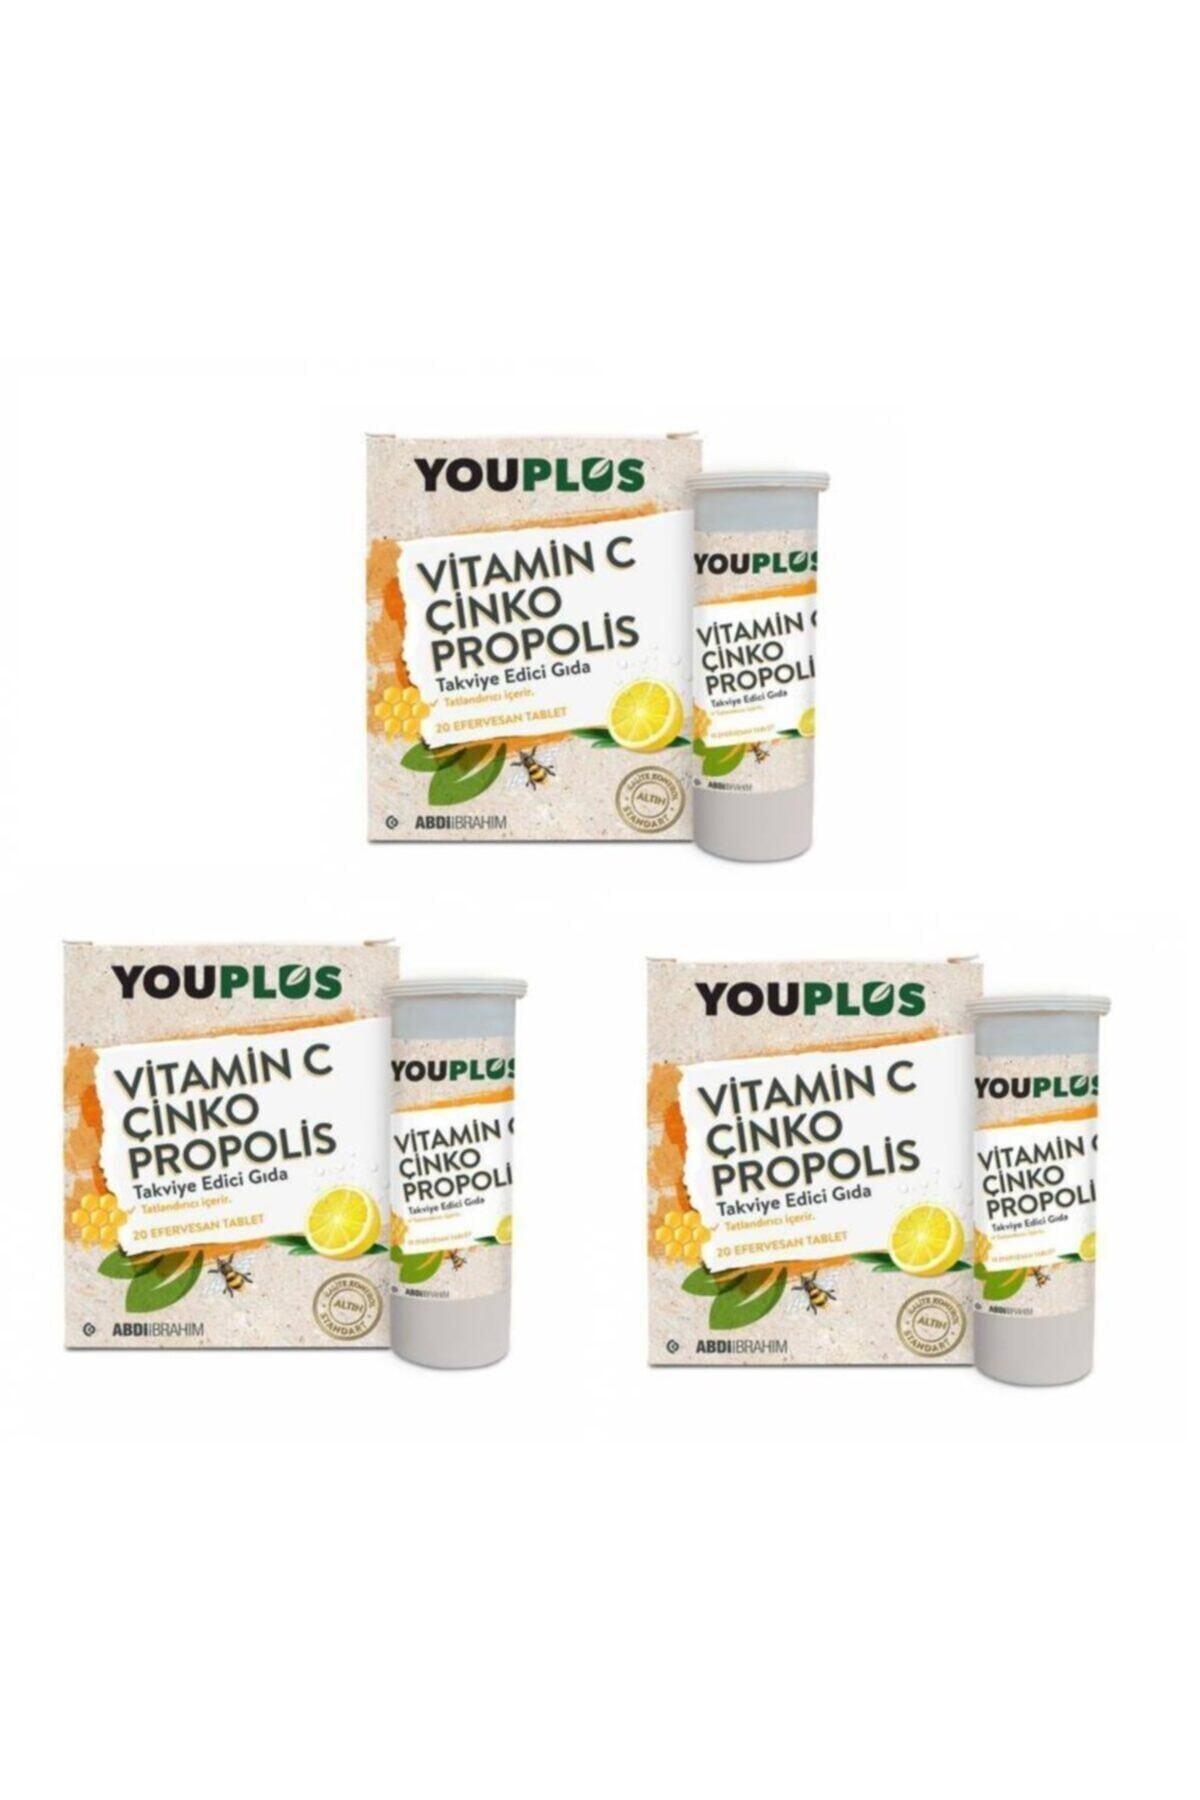 Youplus Vitamin C Çinko Propolis 20 Efervesan Tablet 3 Paket 1